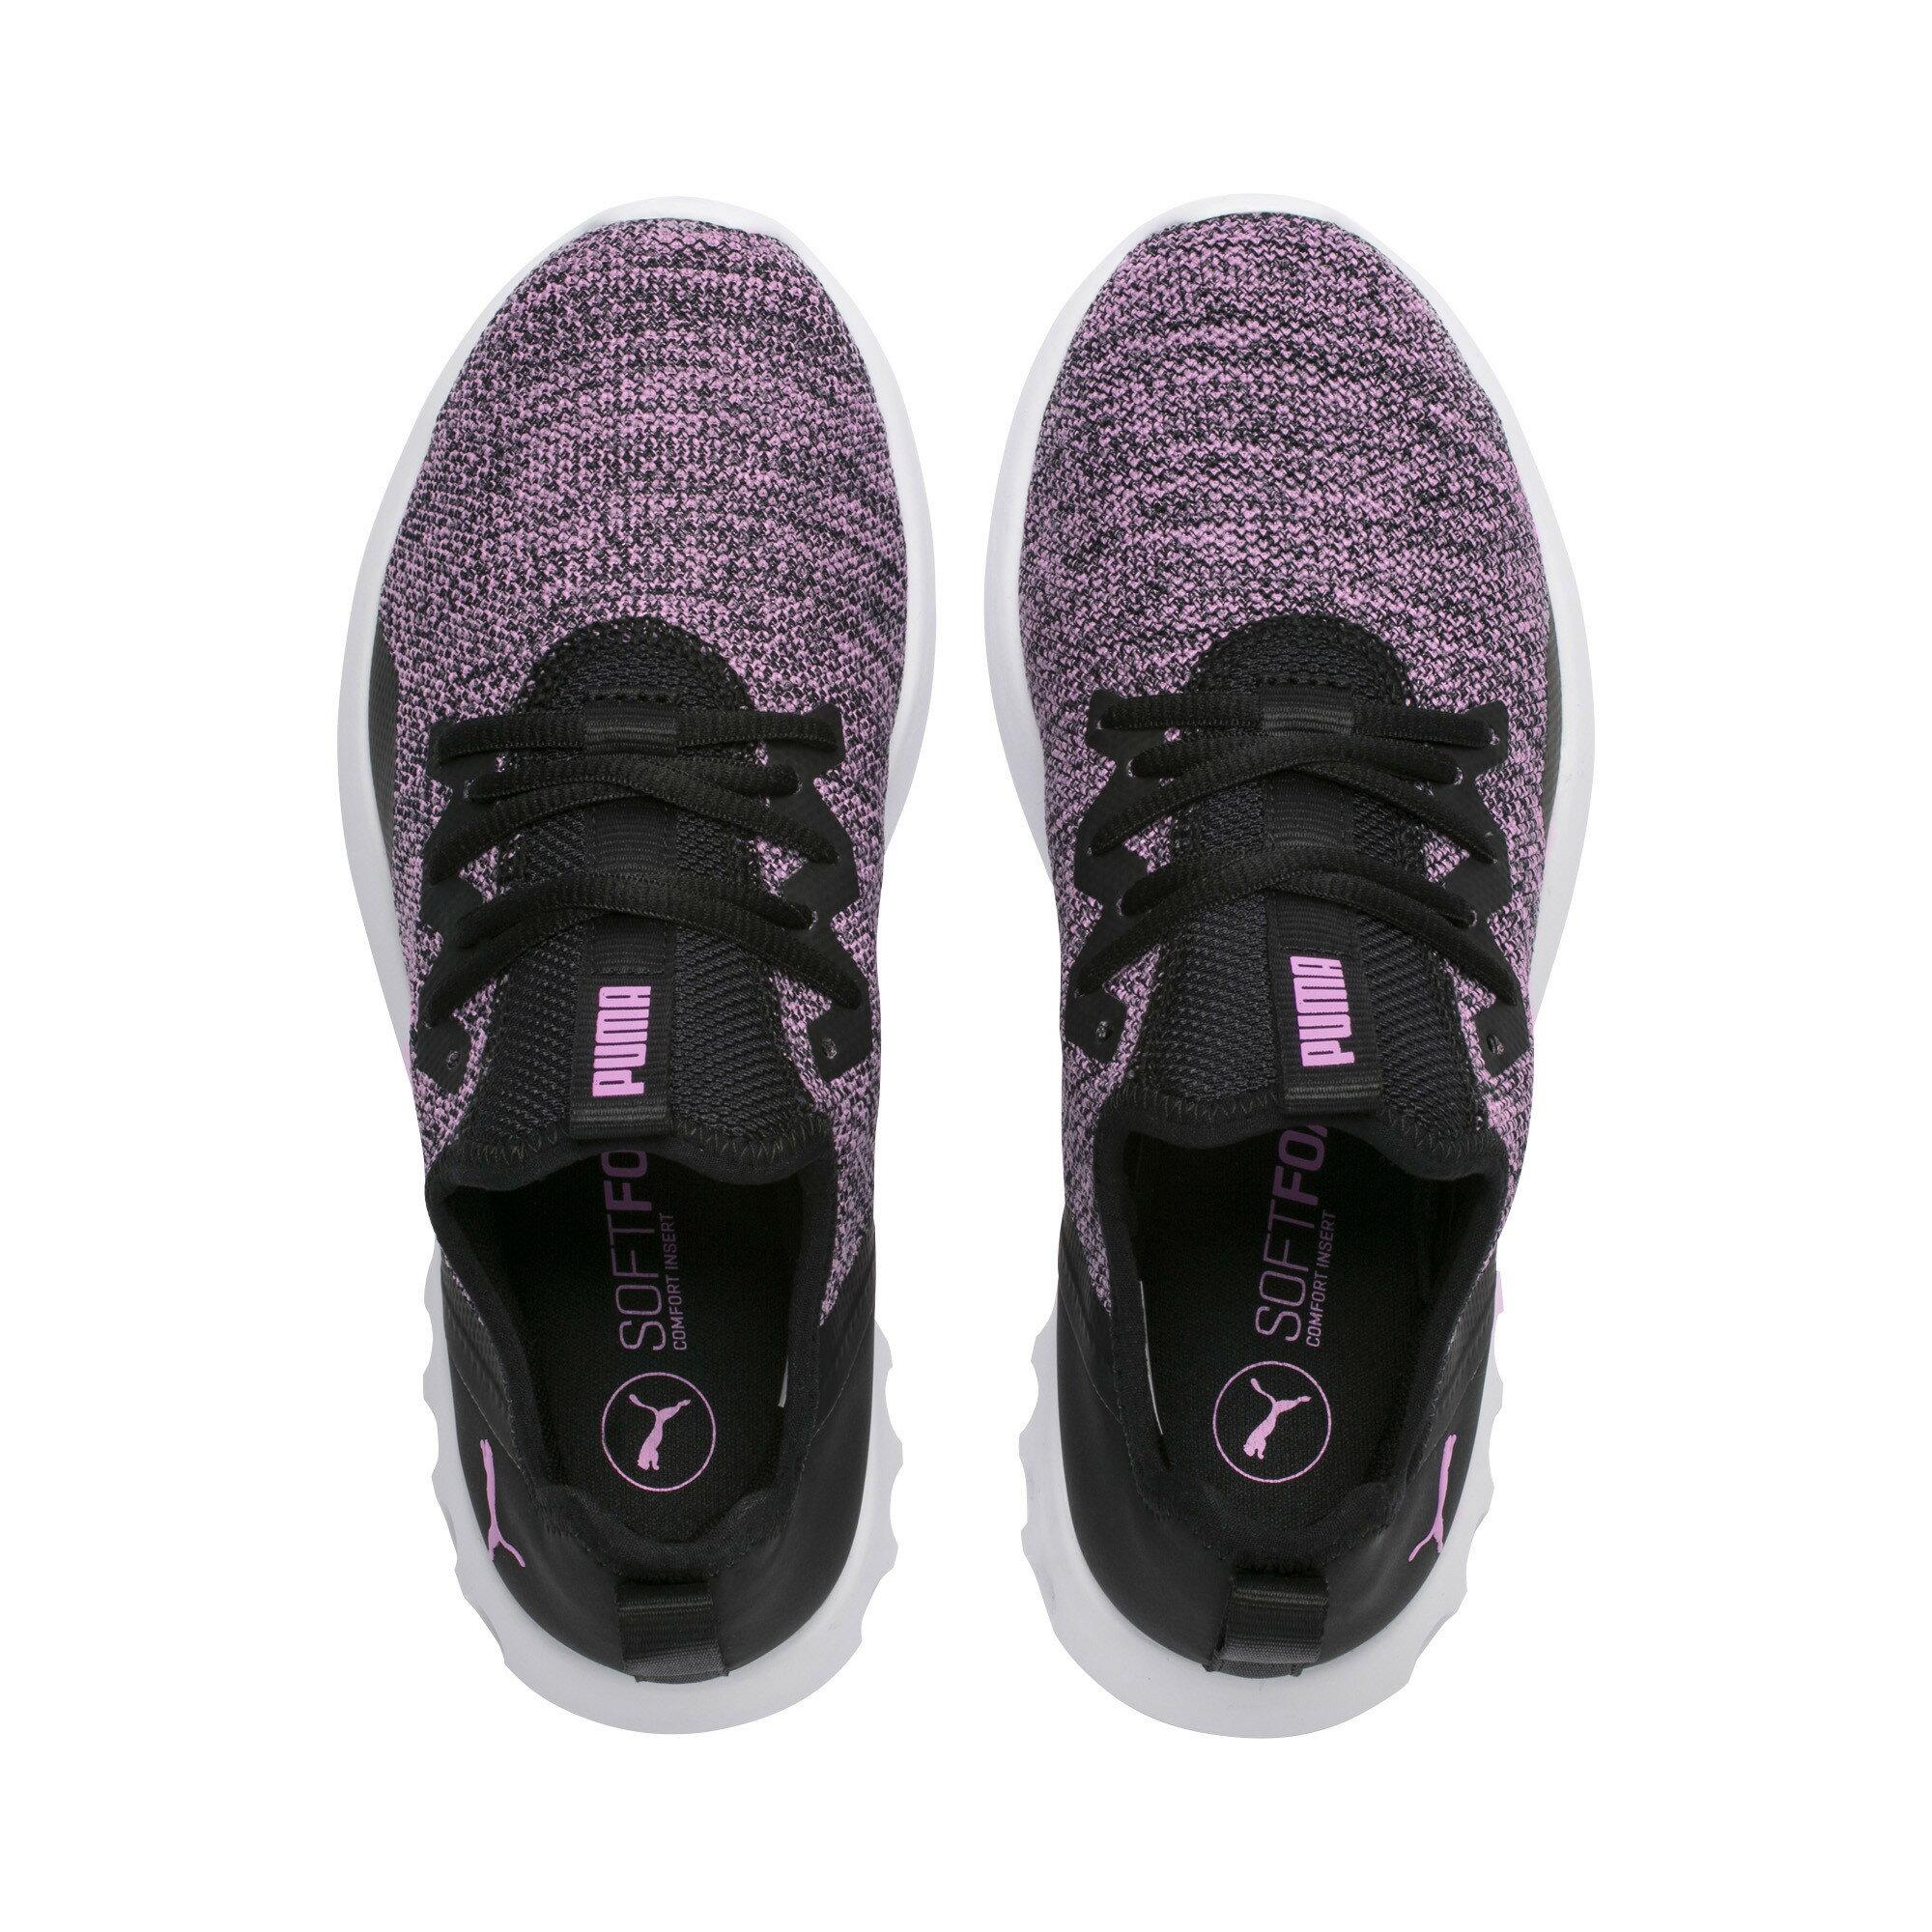 10b0d823f08 Official Puma Store  PUMA Carson 2 X Knit Women s Running Shoes ...